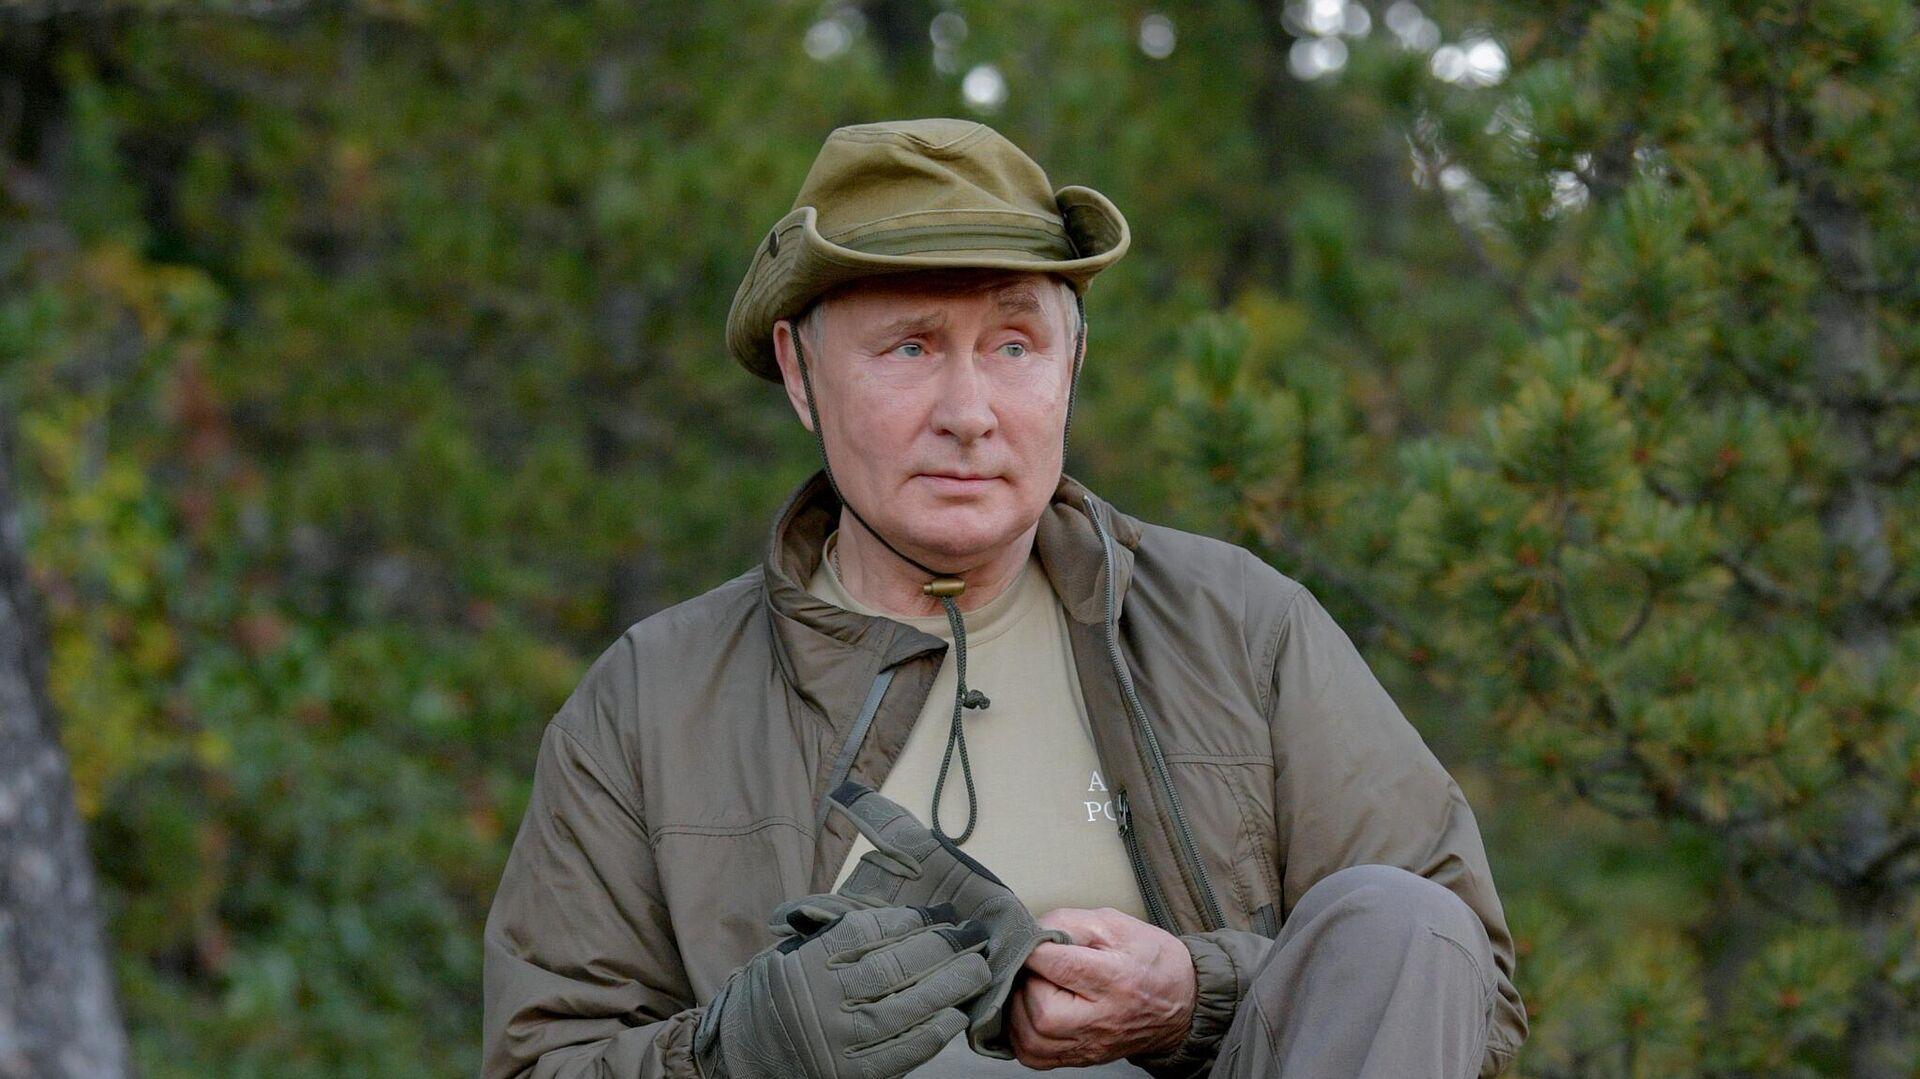 Президент РФ Владимир Путин во время прогулки в тайге - РИА Новости, 1920, 26.09.2021